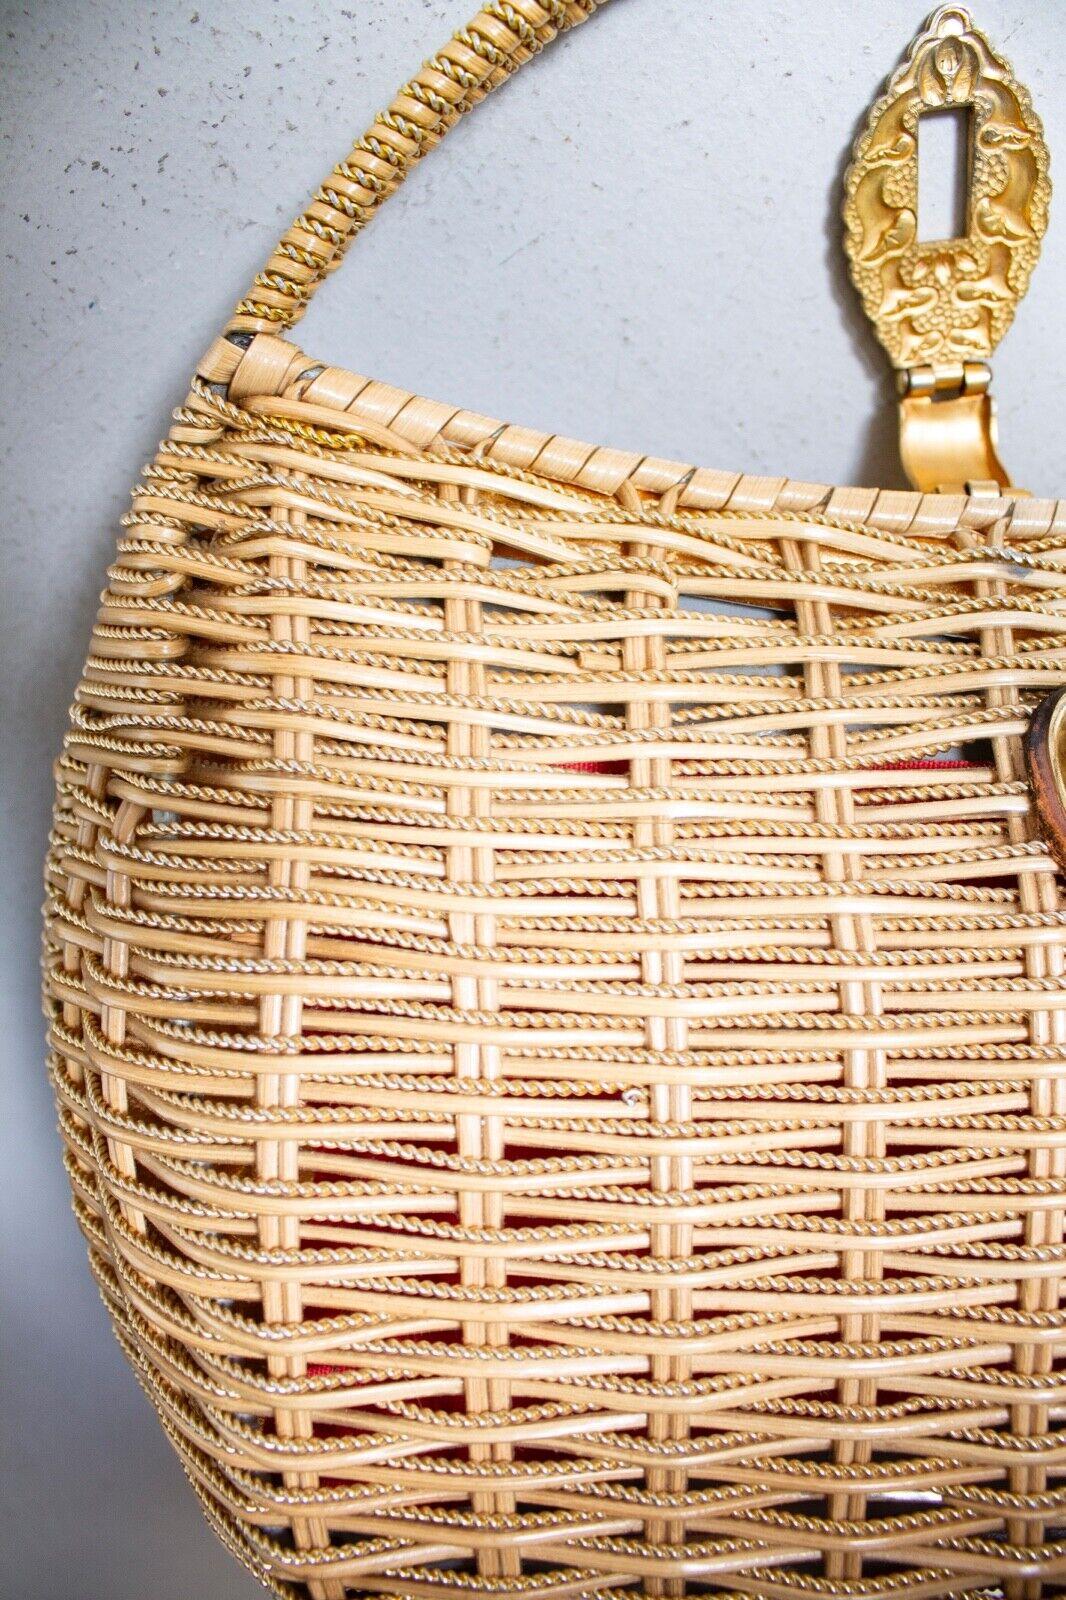 Vintage Basket Purse 1960s Gold Metal Woven Wicke… - image 7